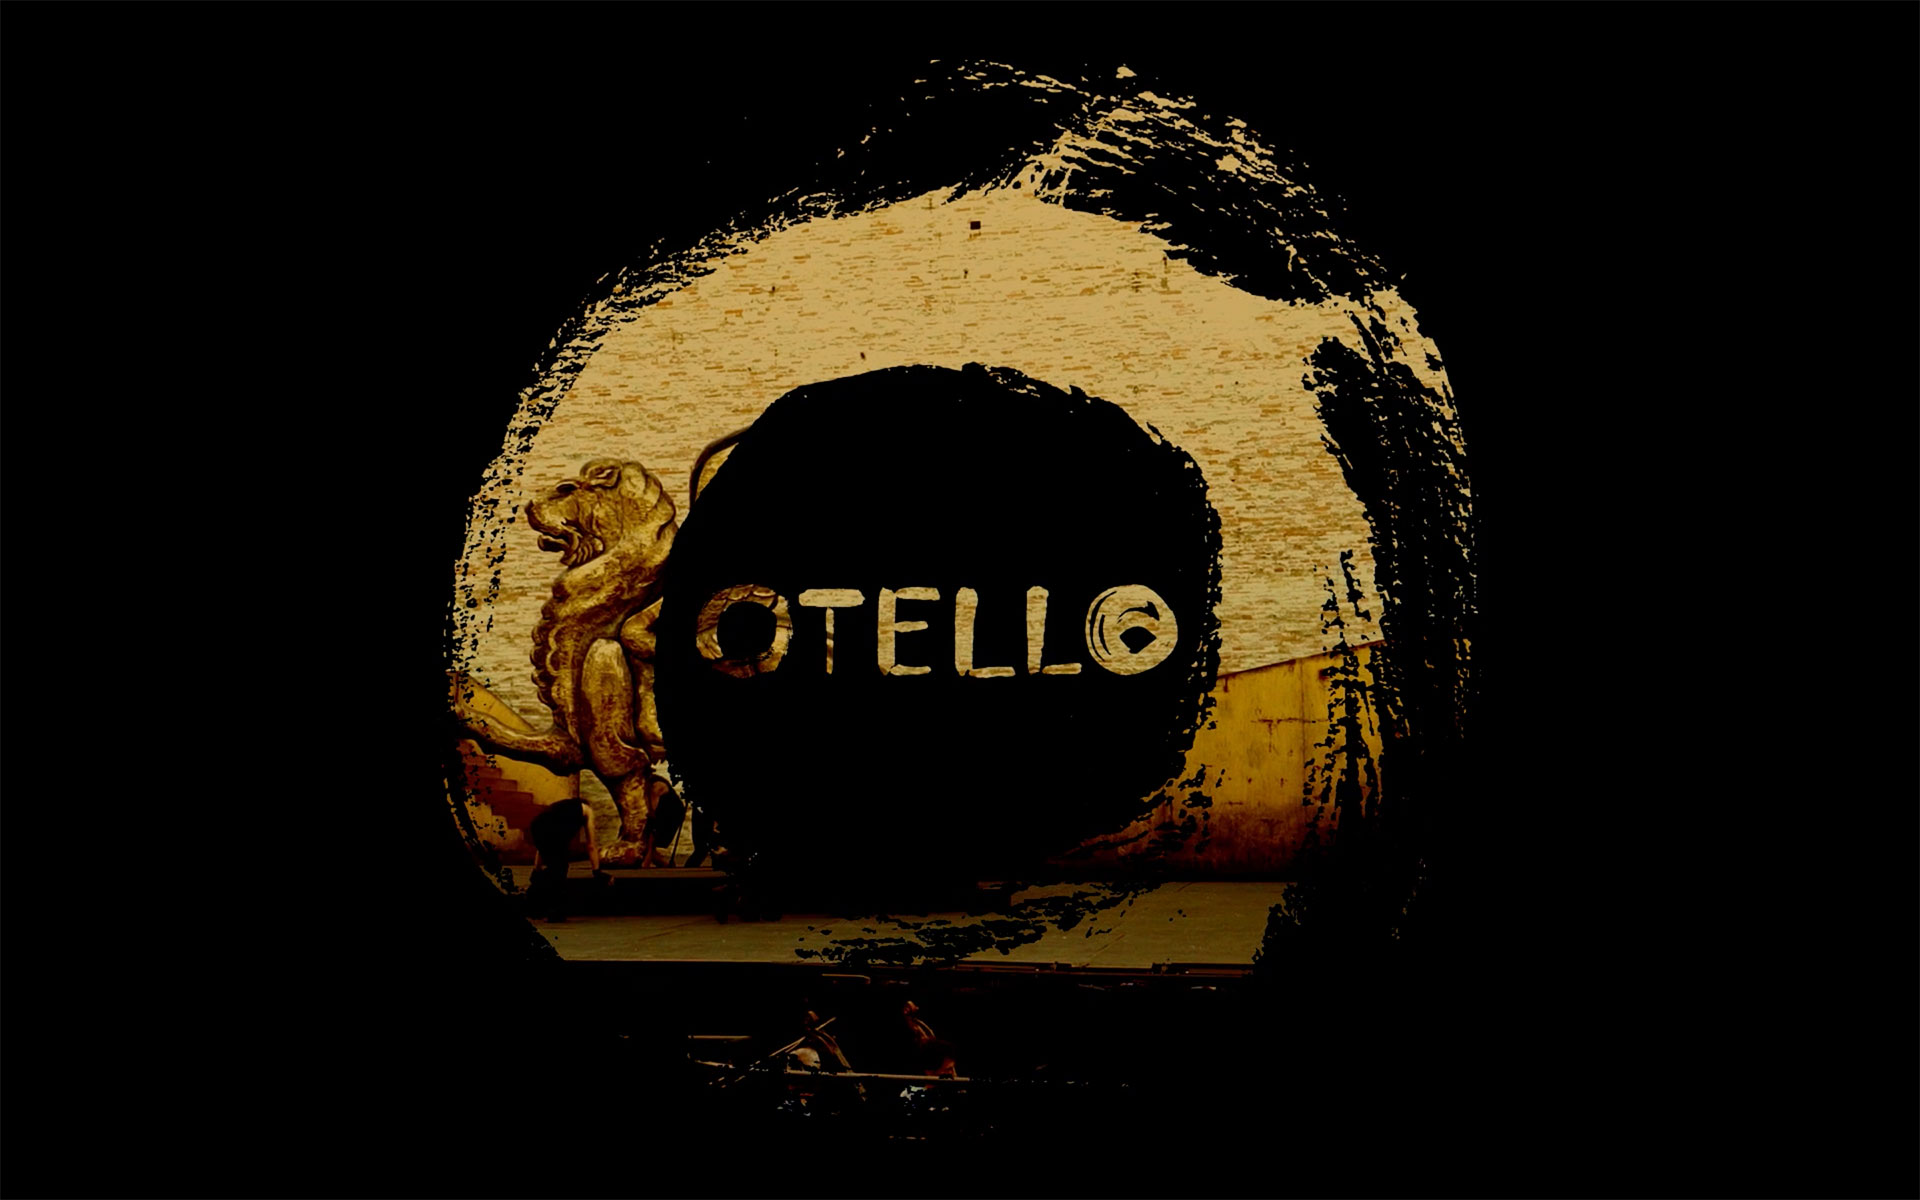 otello, Macerata opera Festival, alia simoncini videomaker